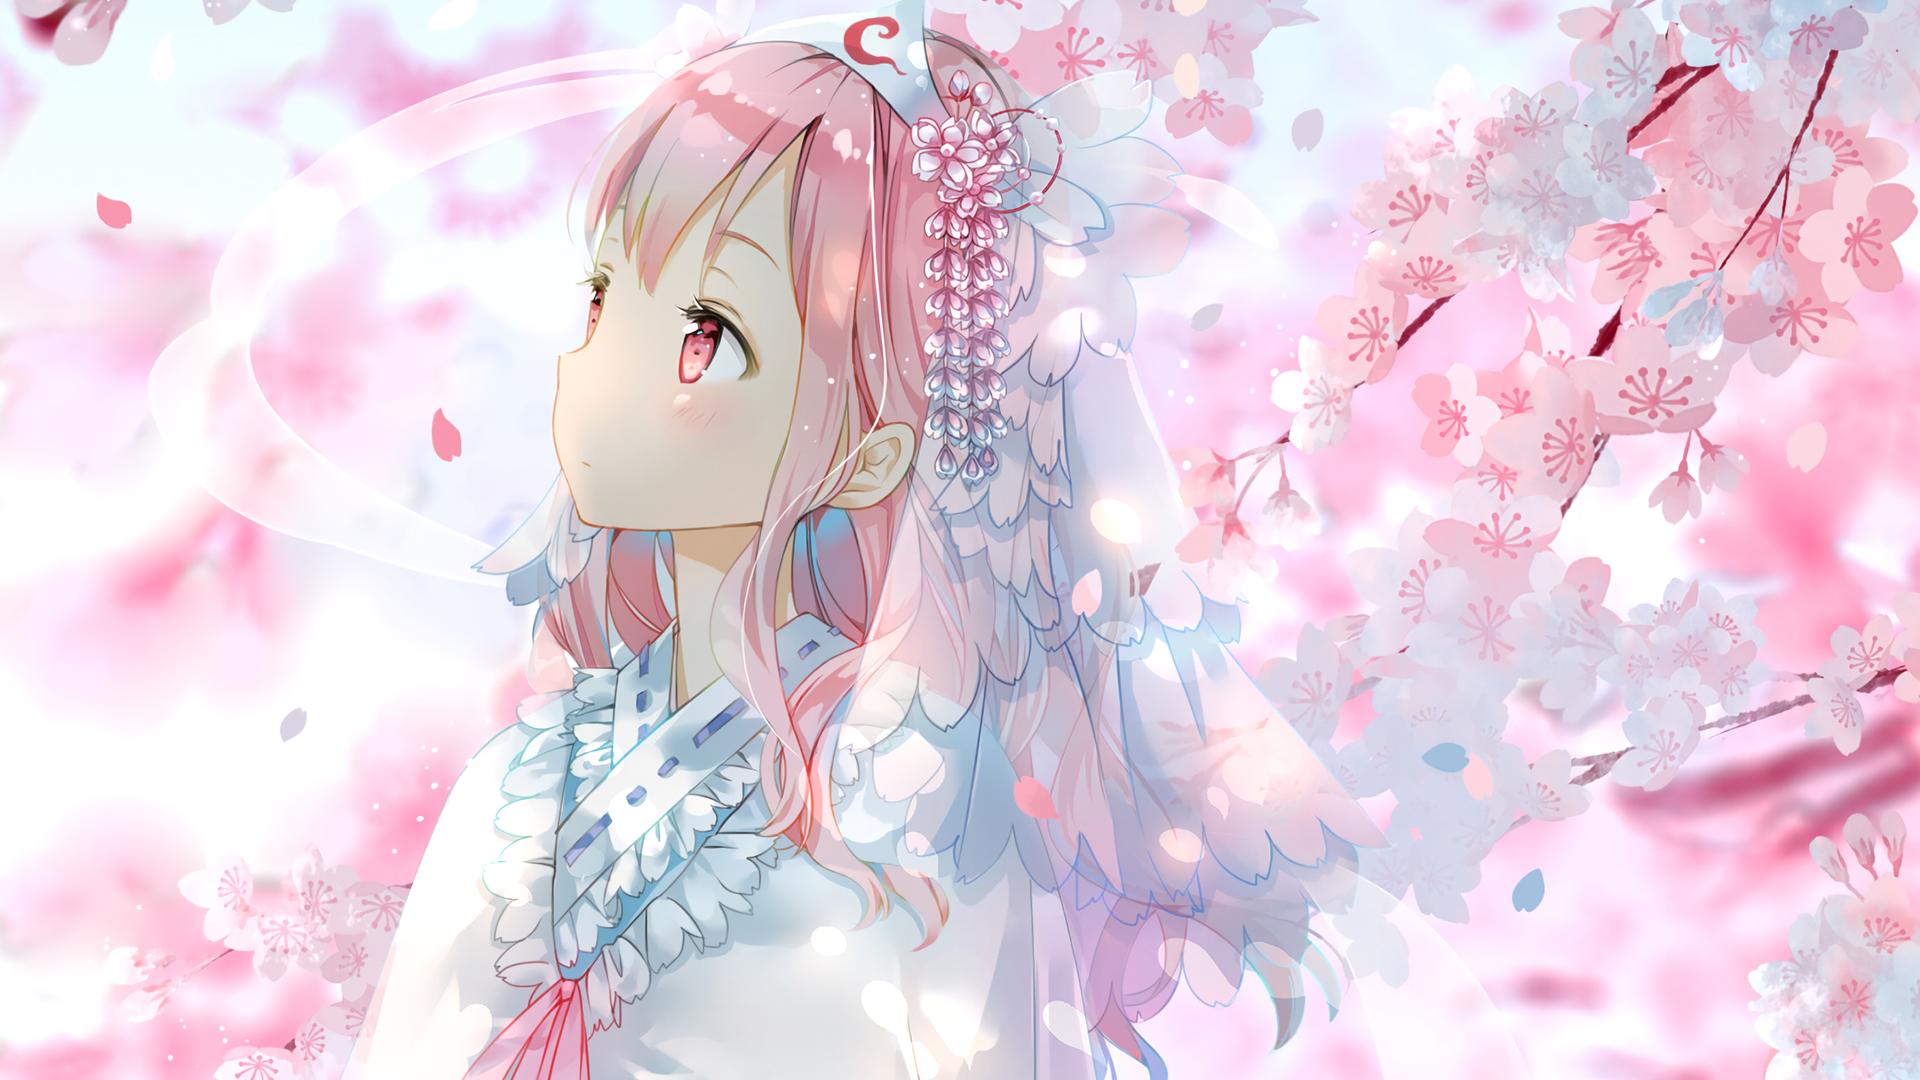 touhou princess hd wallpaper | background image | 1920x1080 | id